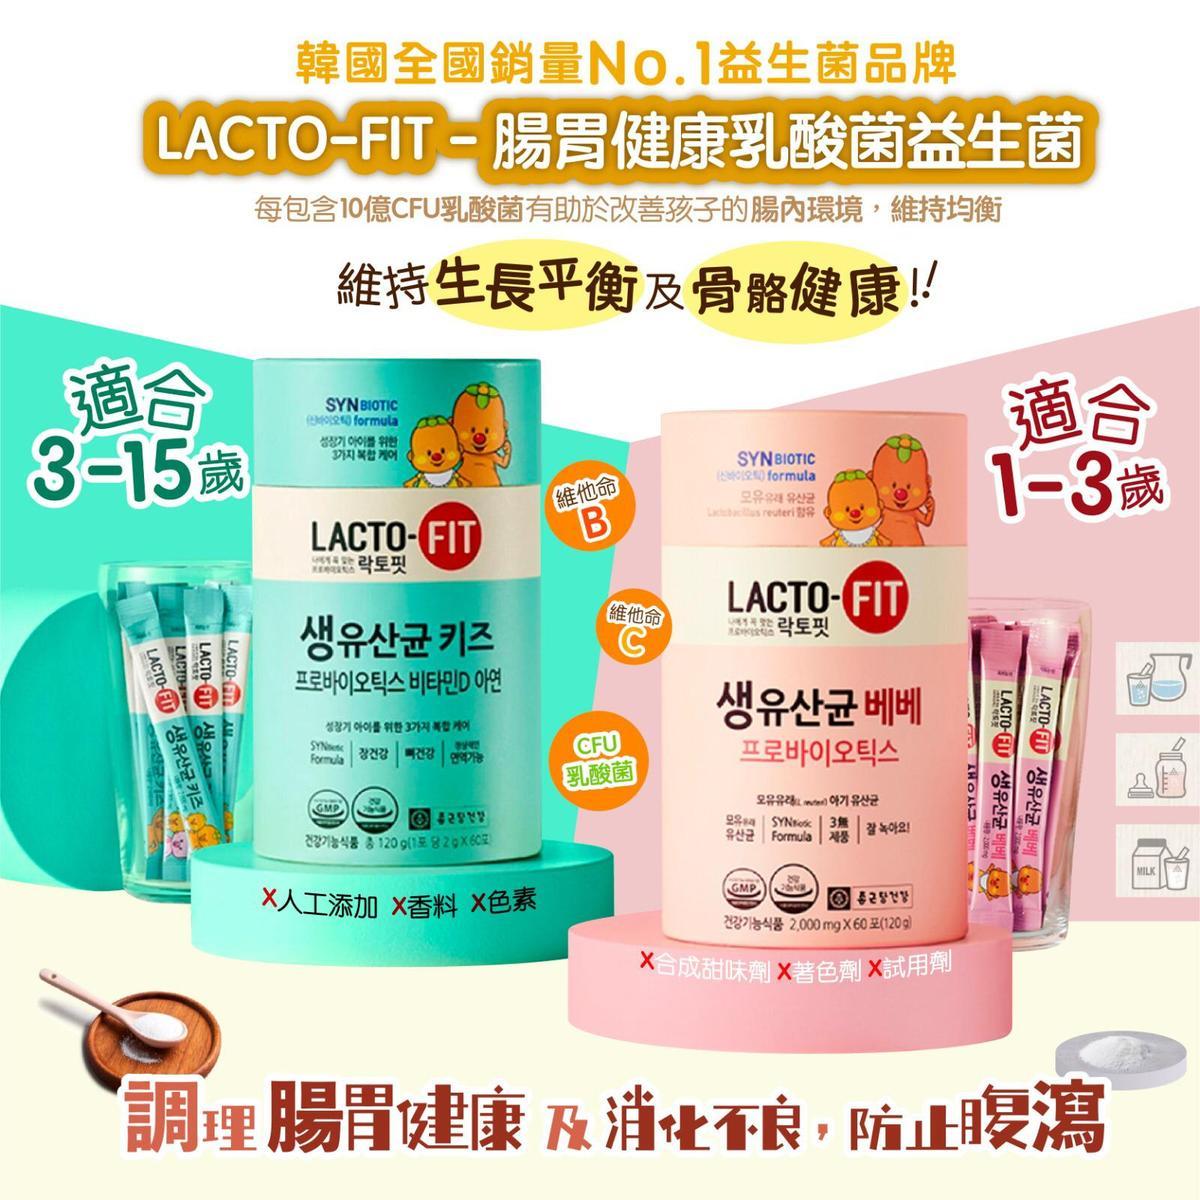 Lacto-Fit 韓國乳酸菌益生菌 (兒童/幼兒)